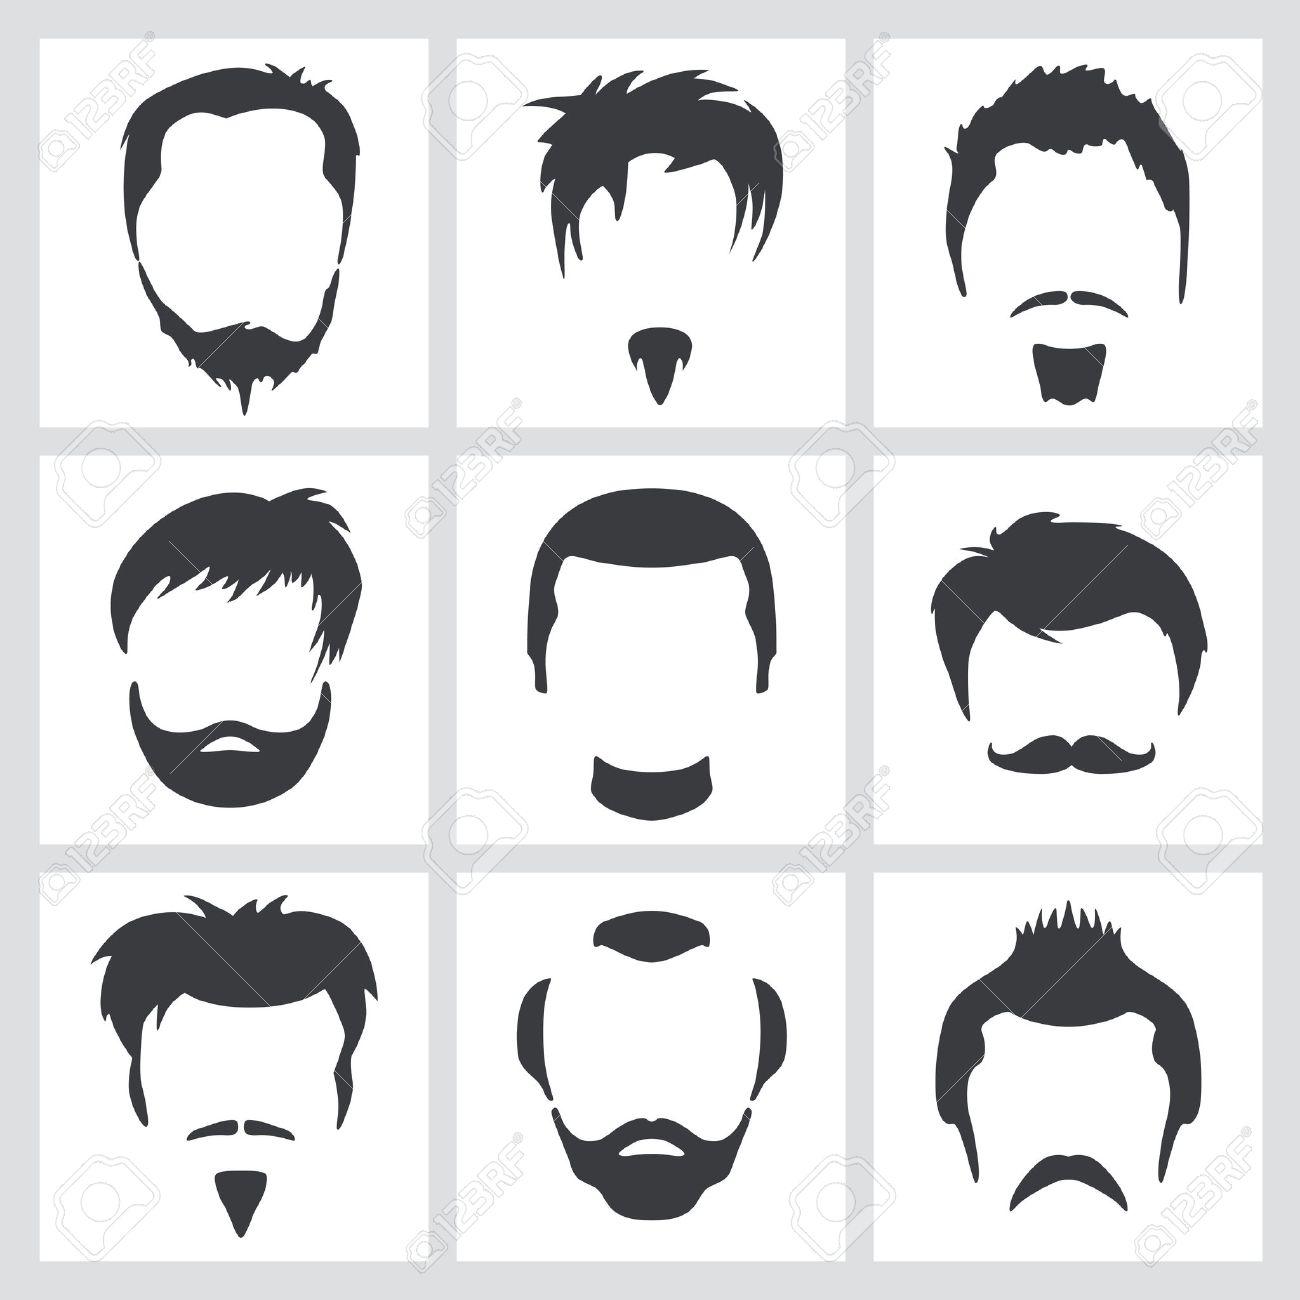 18148950-male-hair-graphics-stock-photo.jpg